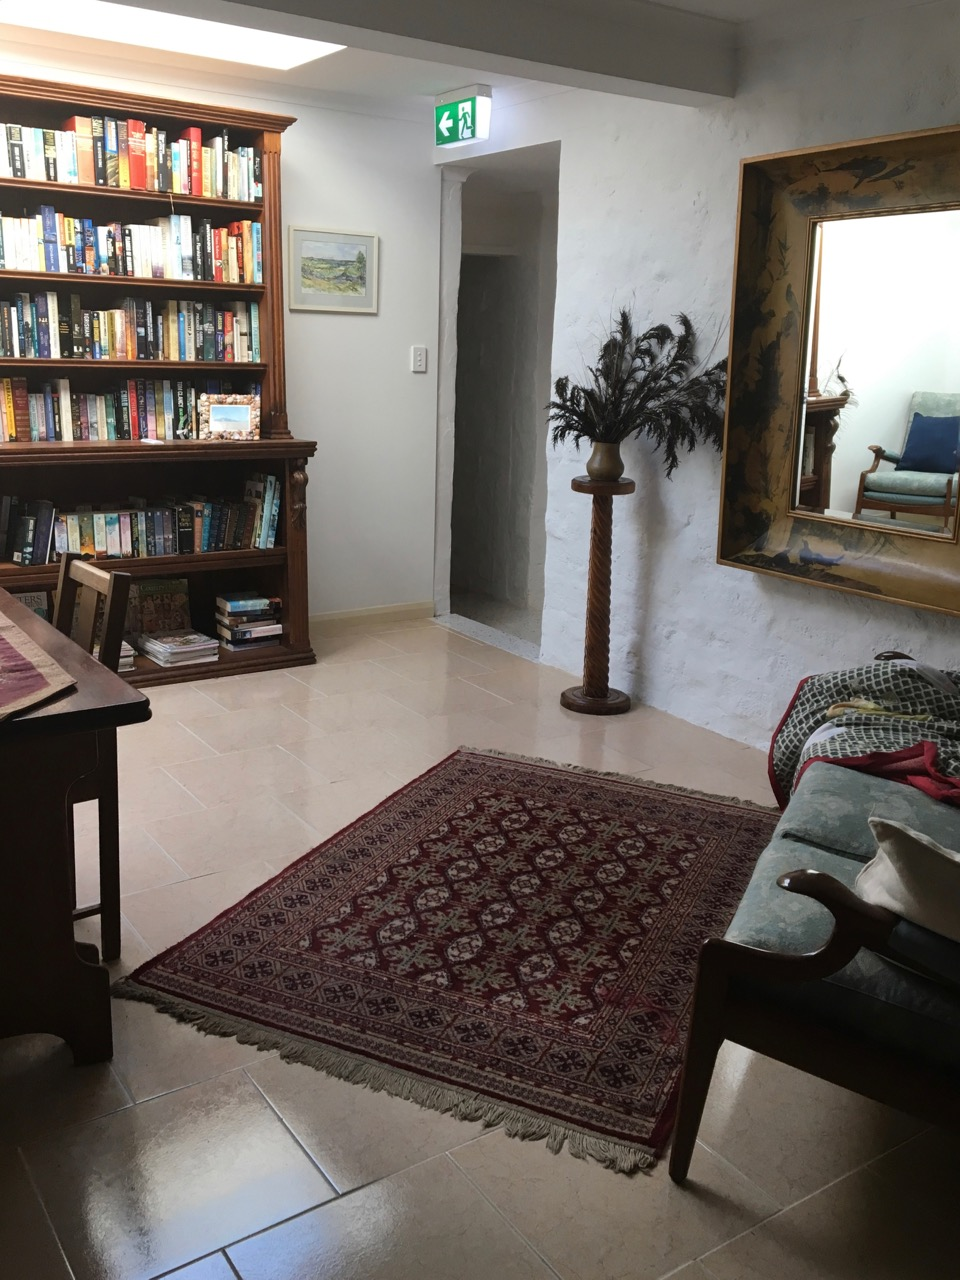 Flinders Island Gourmet Retreat - light court library